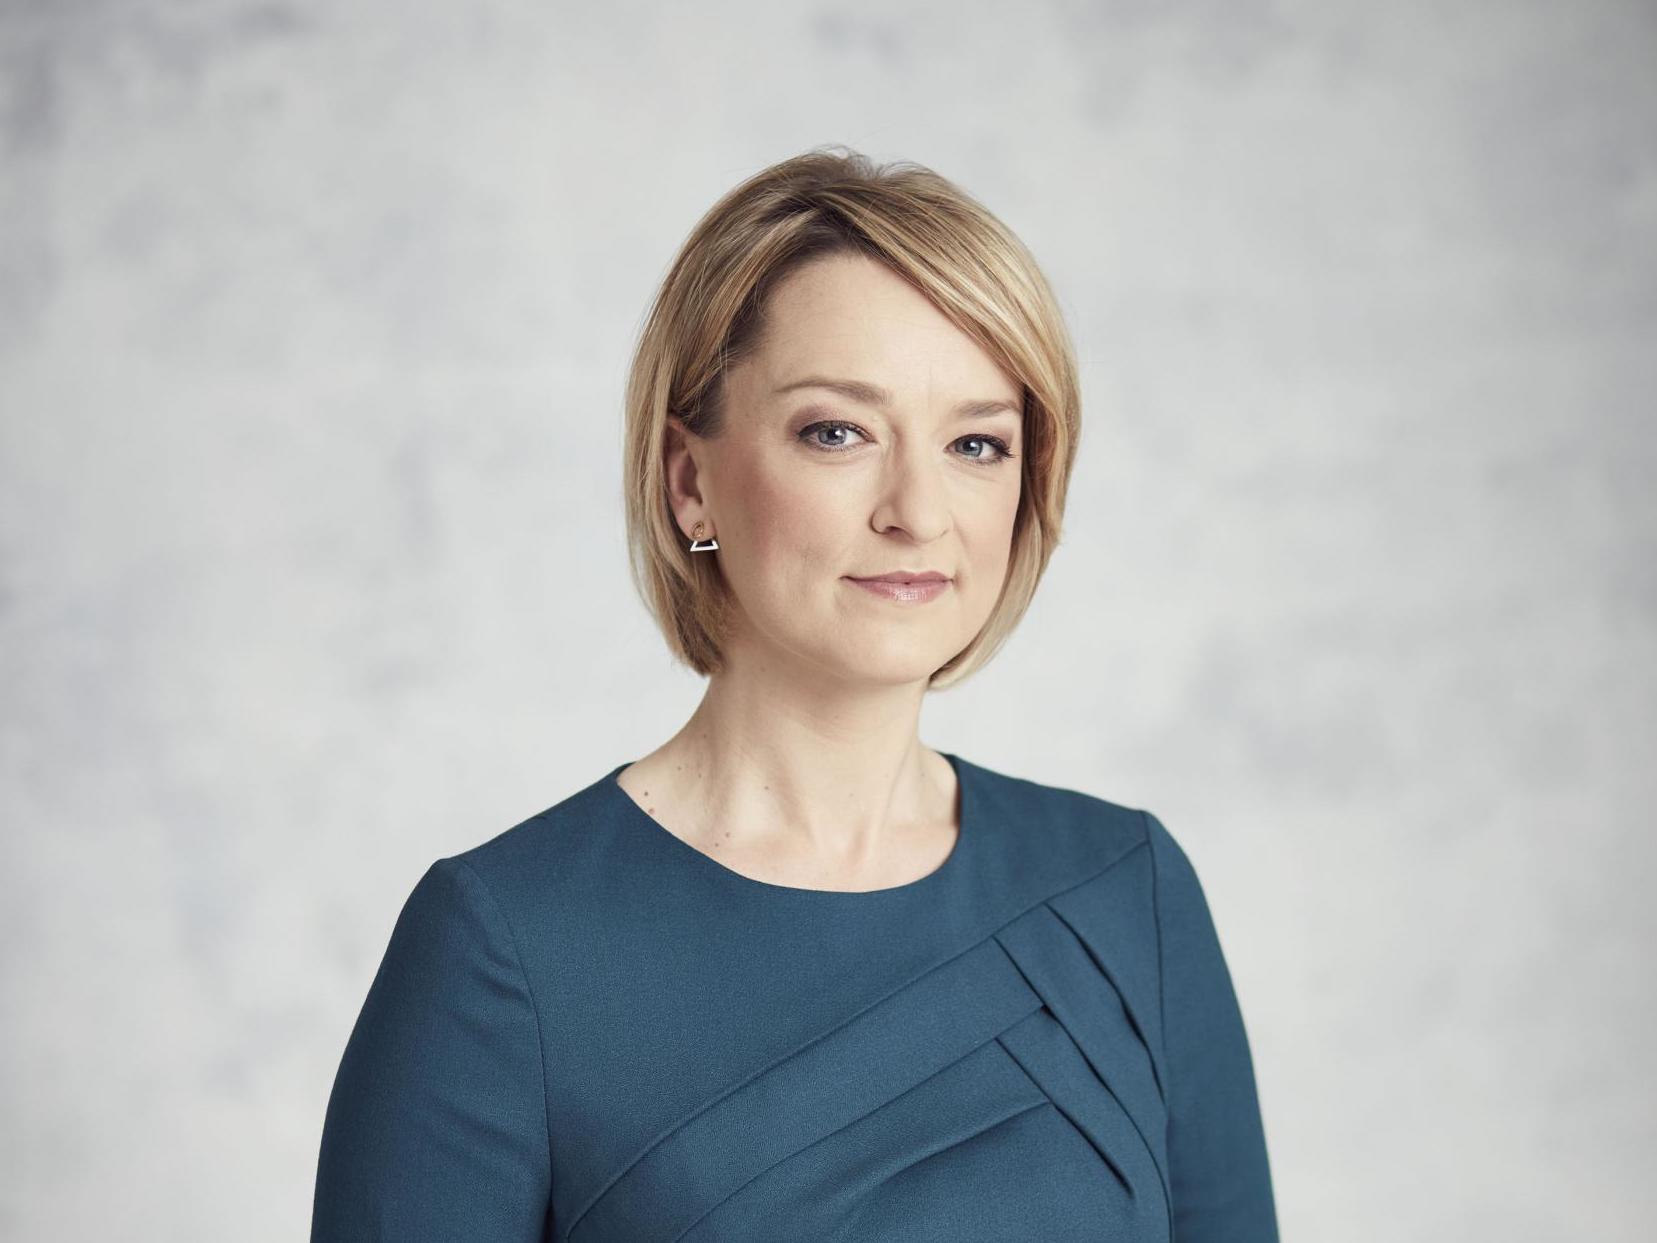 Laura Kuenssberg Biography